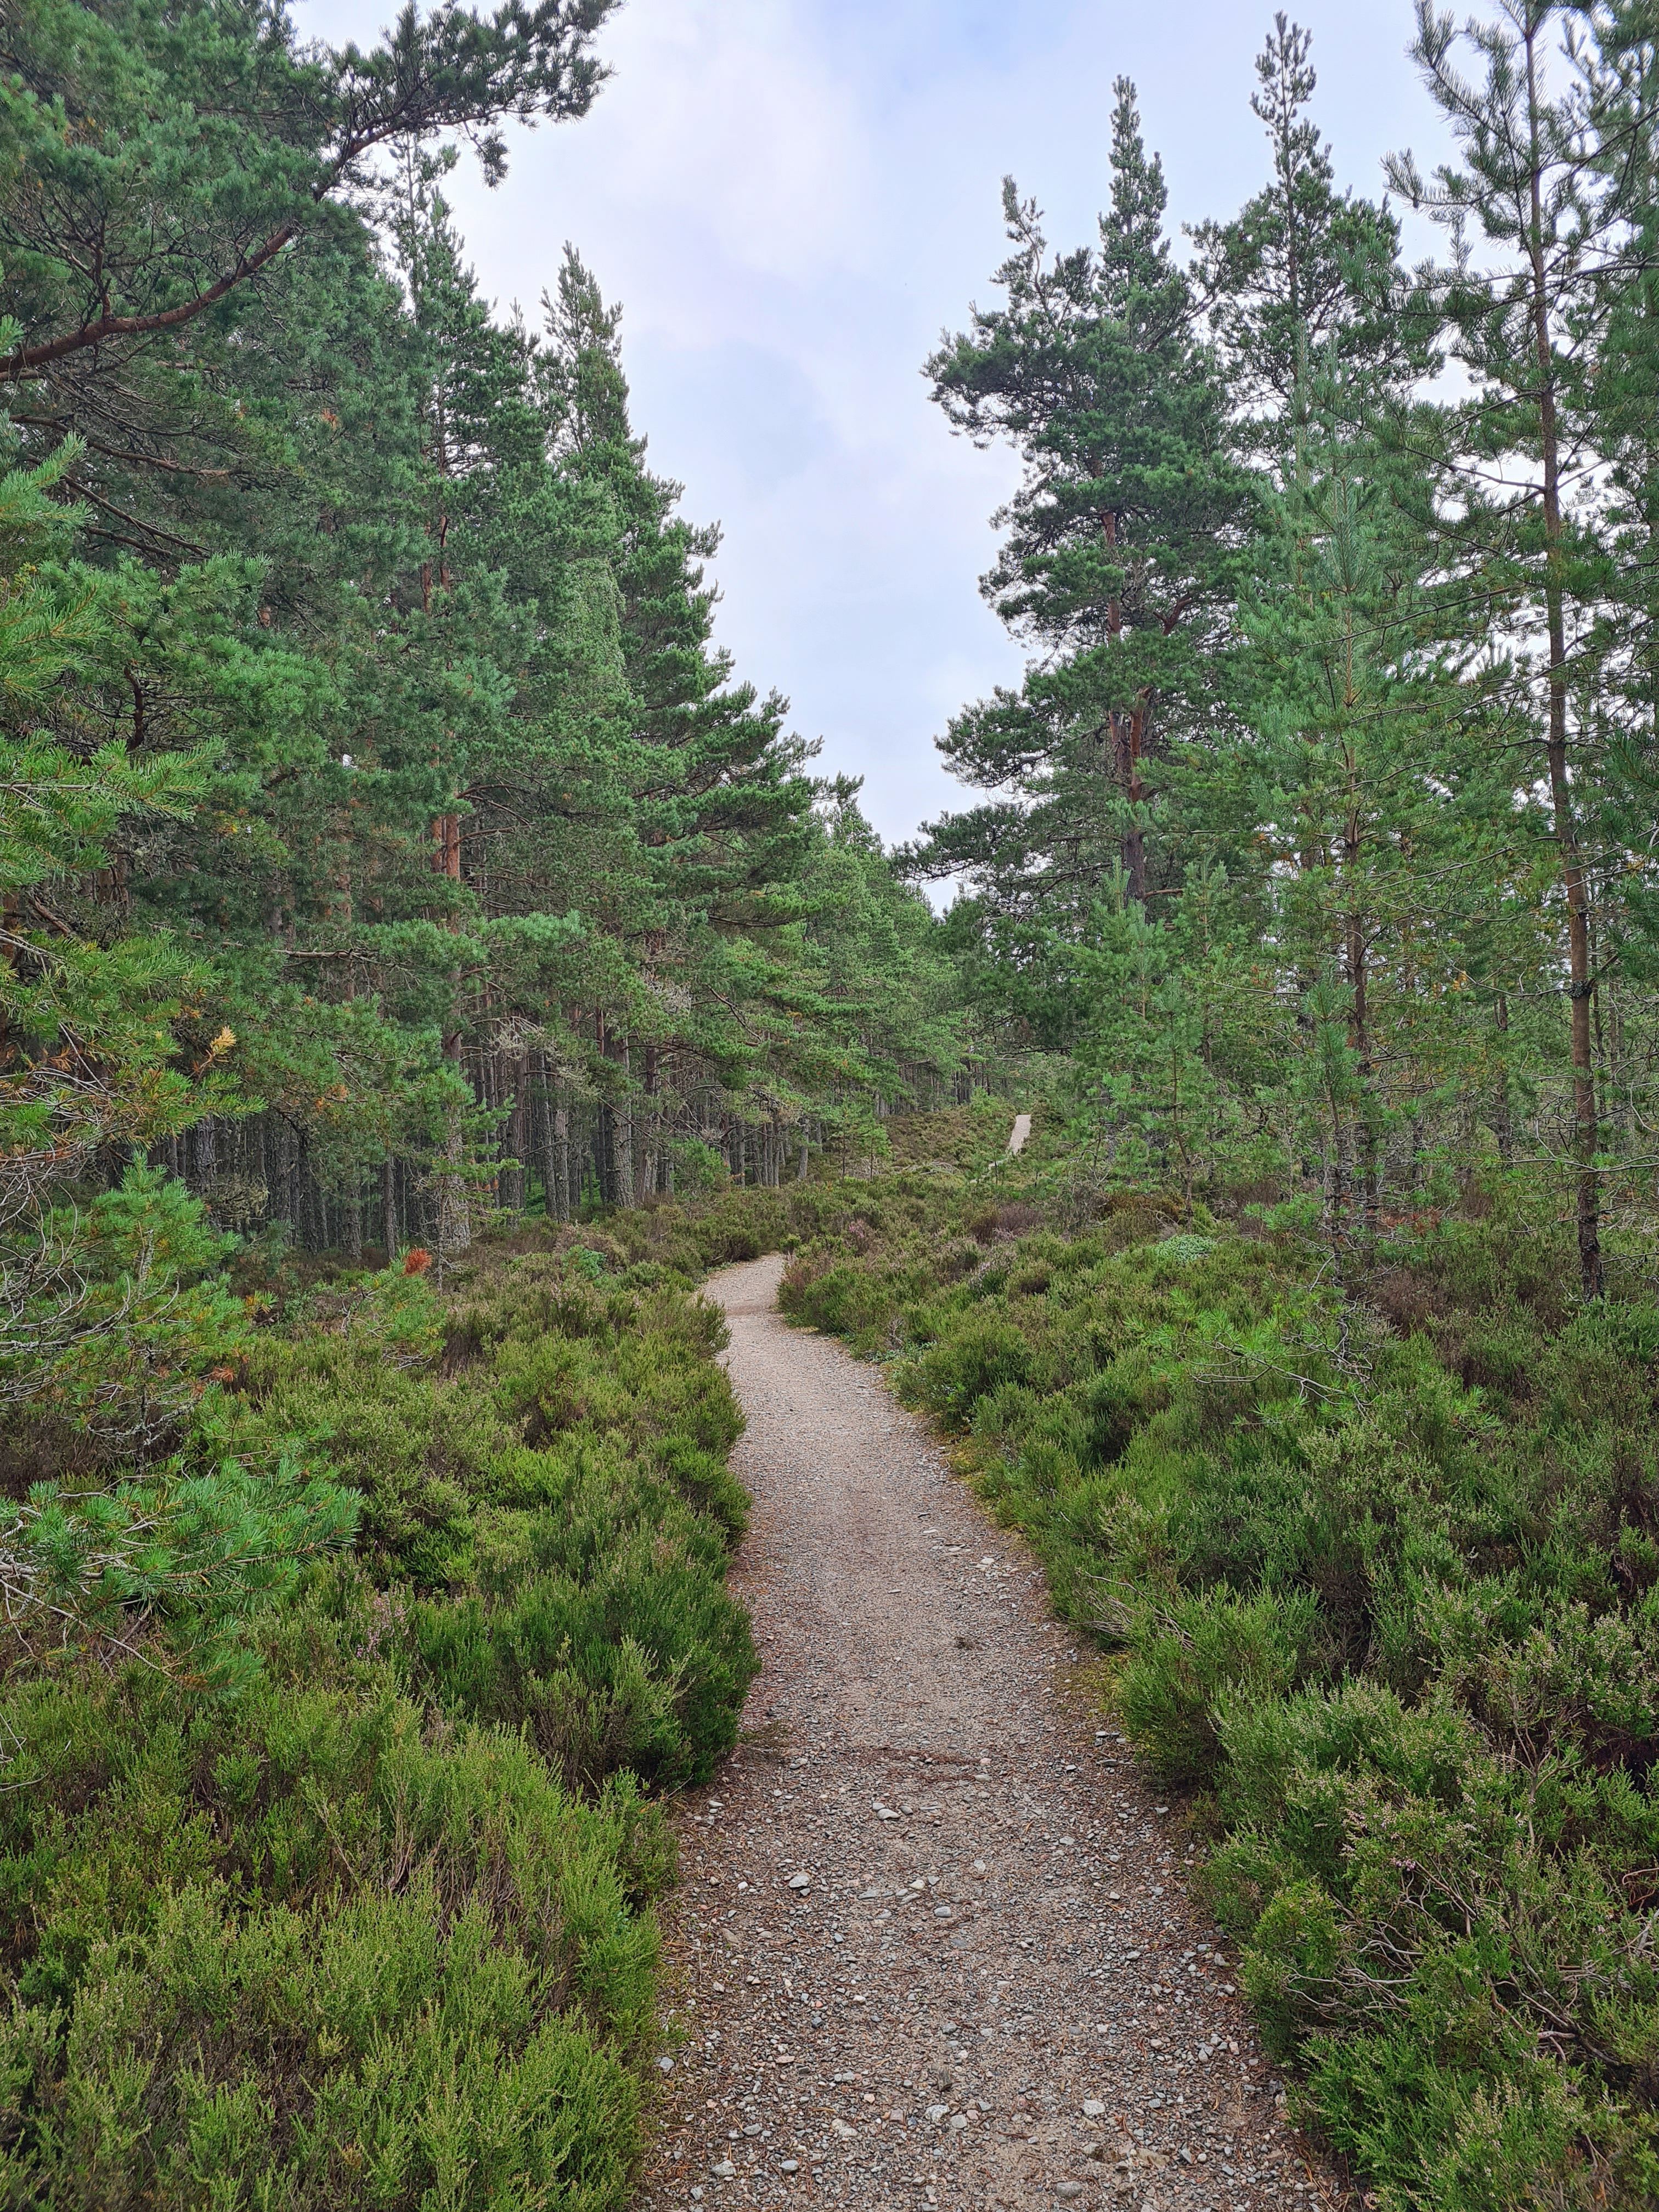 Abernathy National Nature Reserve